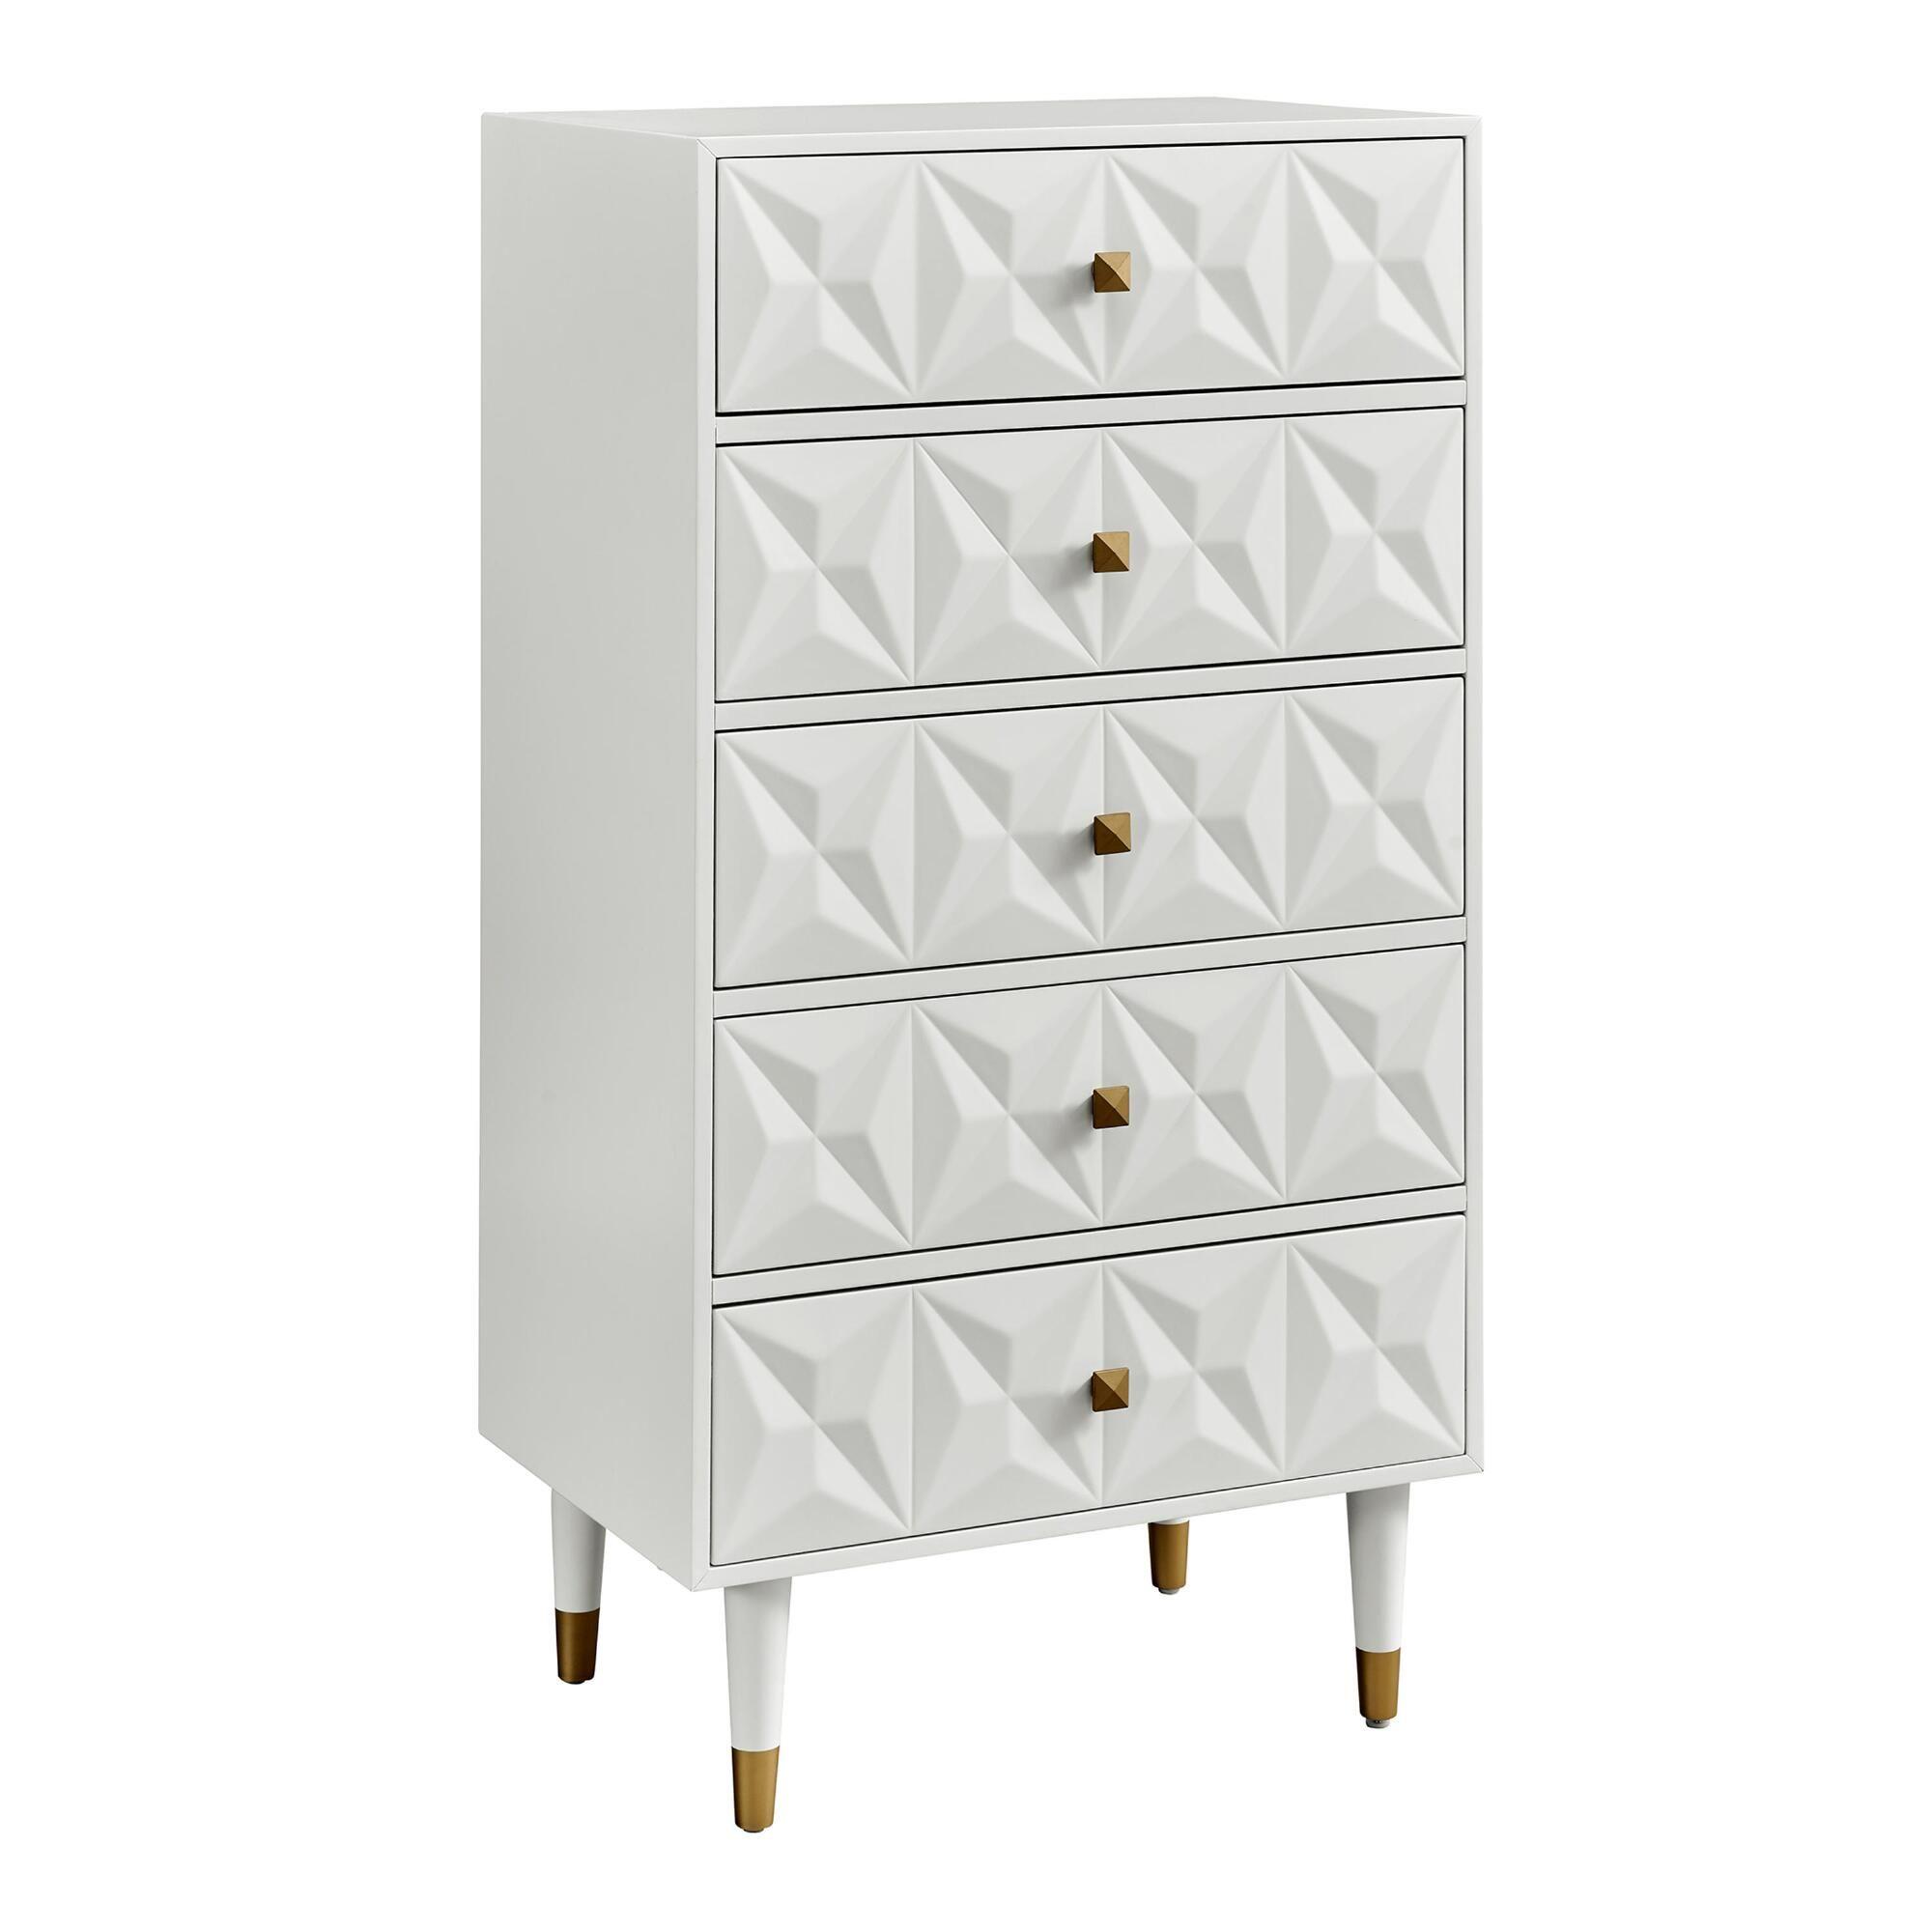 Tall Geometric Wood Porter Dresser Bedroom Furniture Beds Bedroom Storage Bedroom Furnishings [ 2000 x 2000 Pixel ]